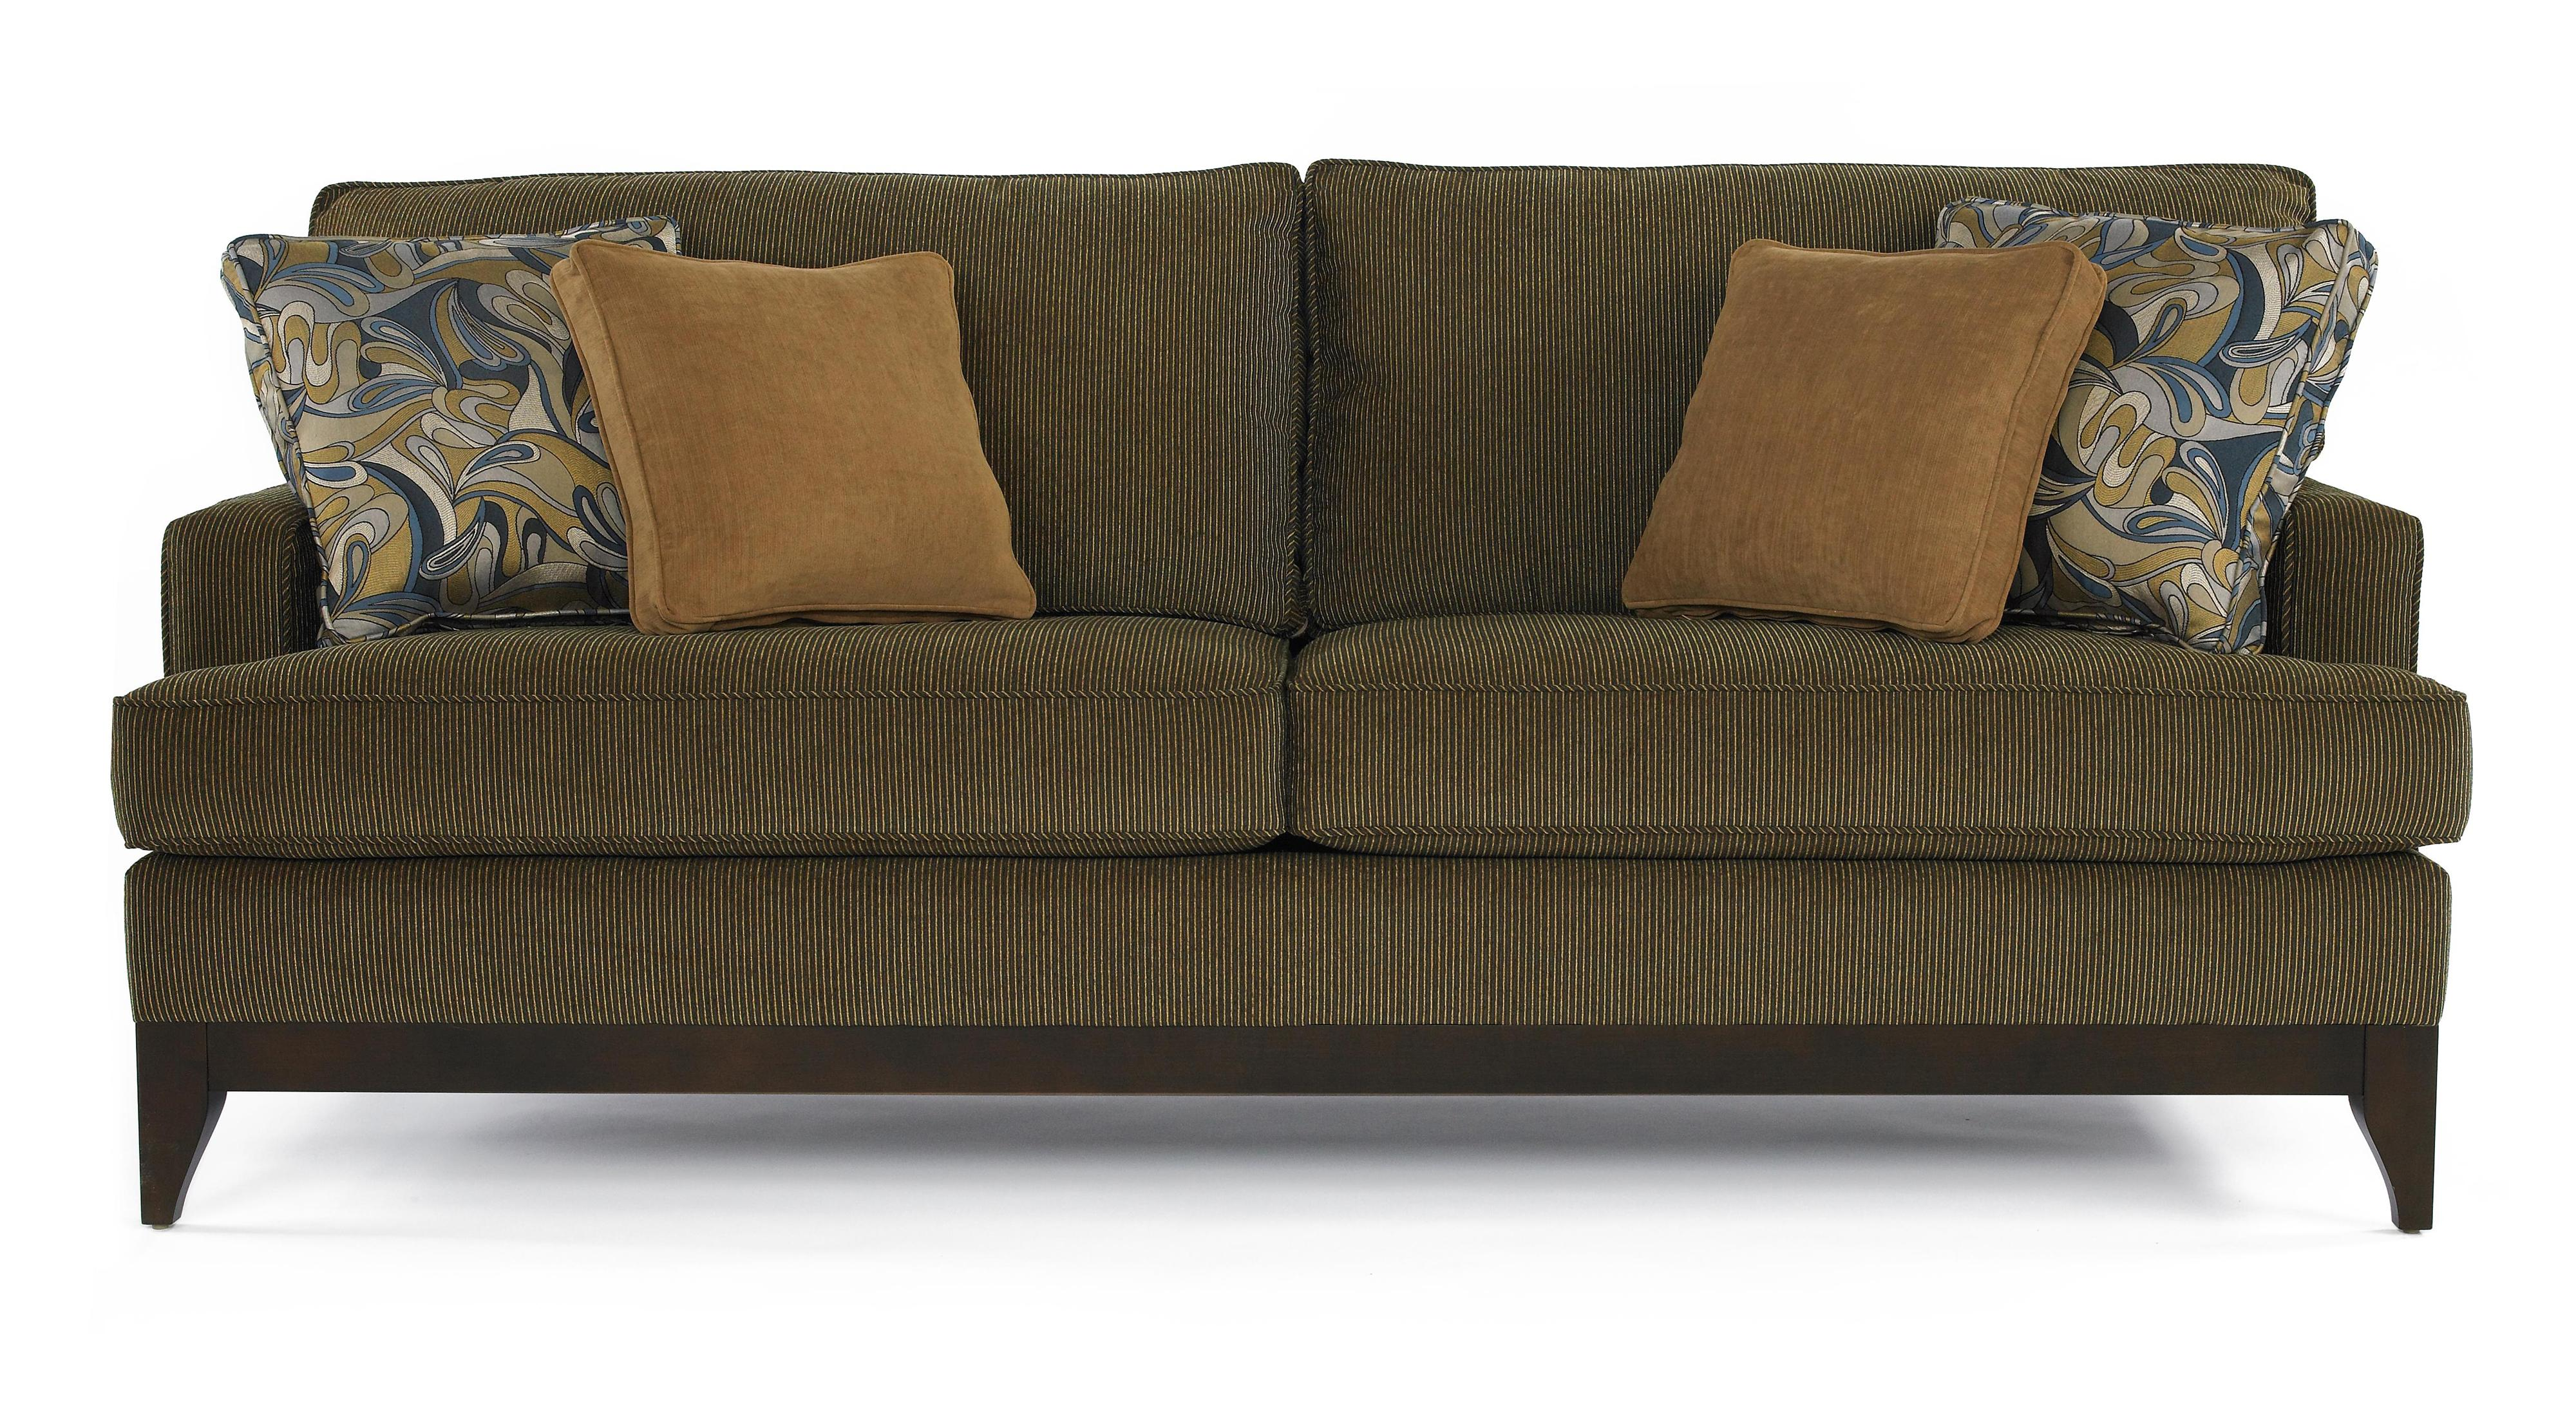 kincaid sofas reviews recliner sofa in hyderabad india furniture alston contemporary ahfa